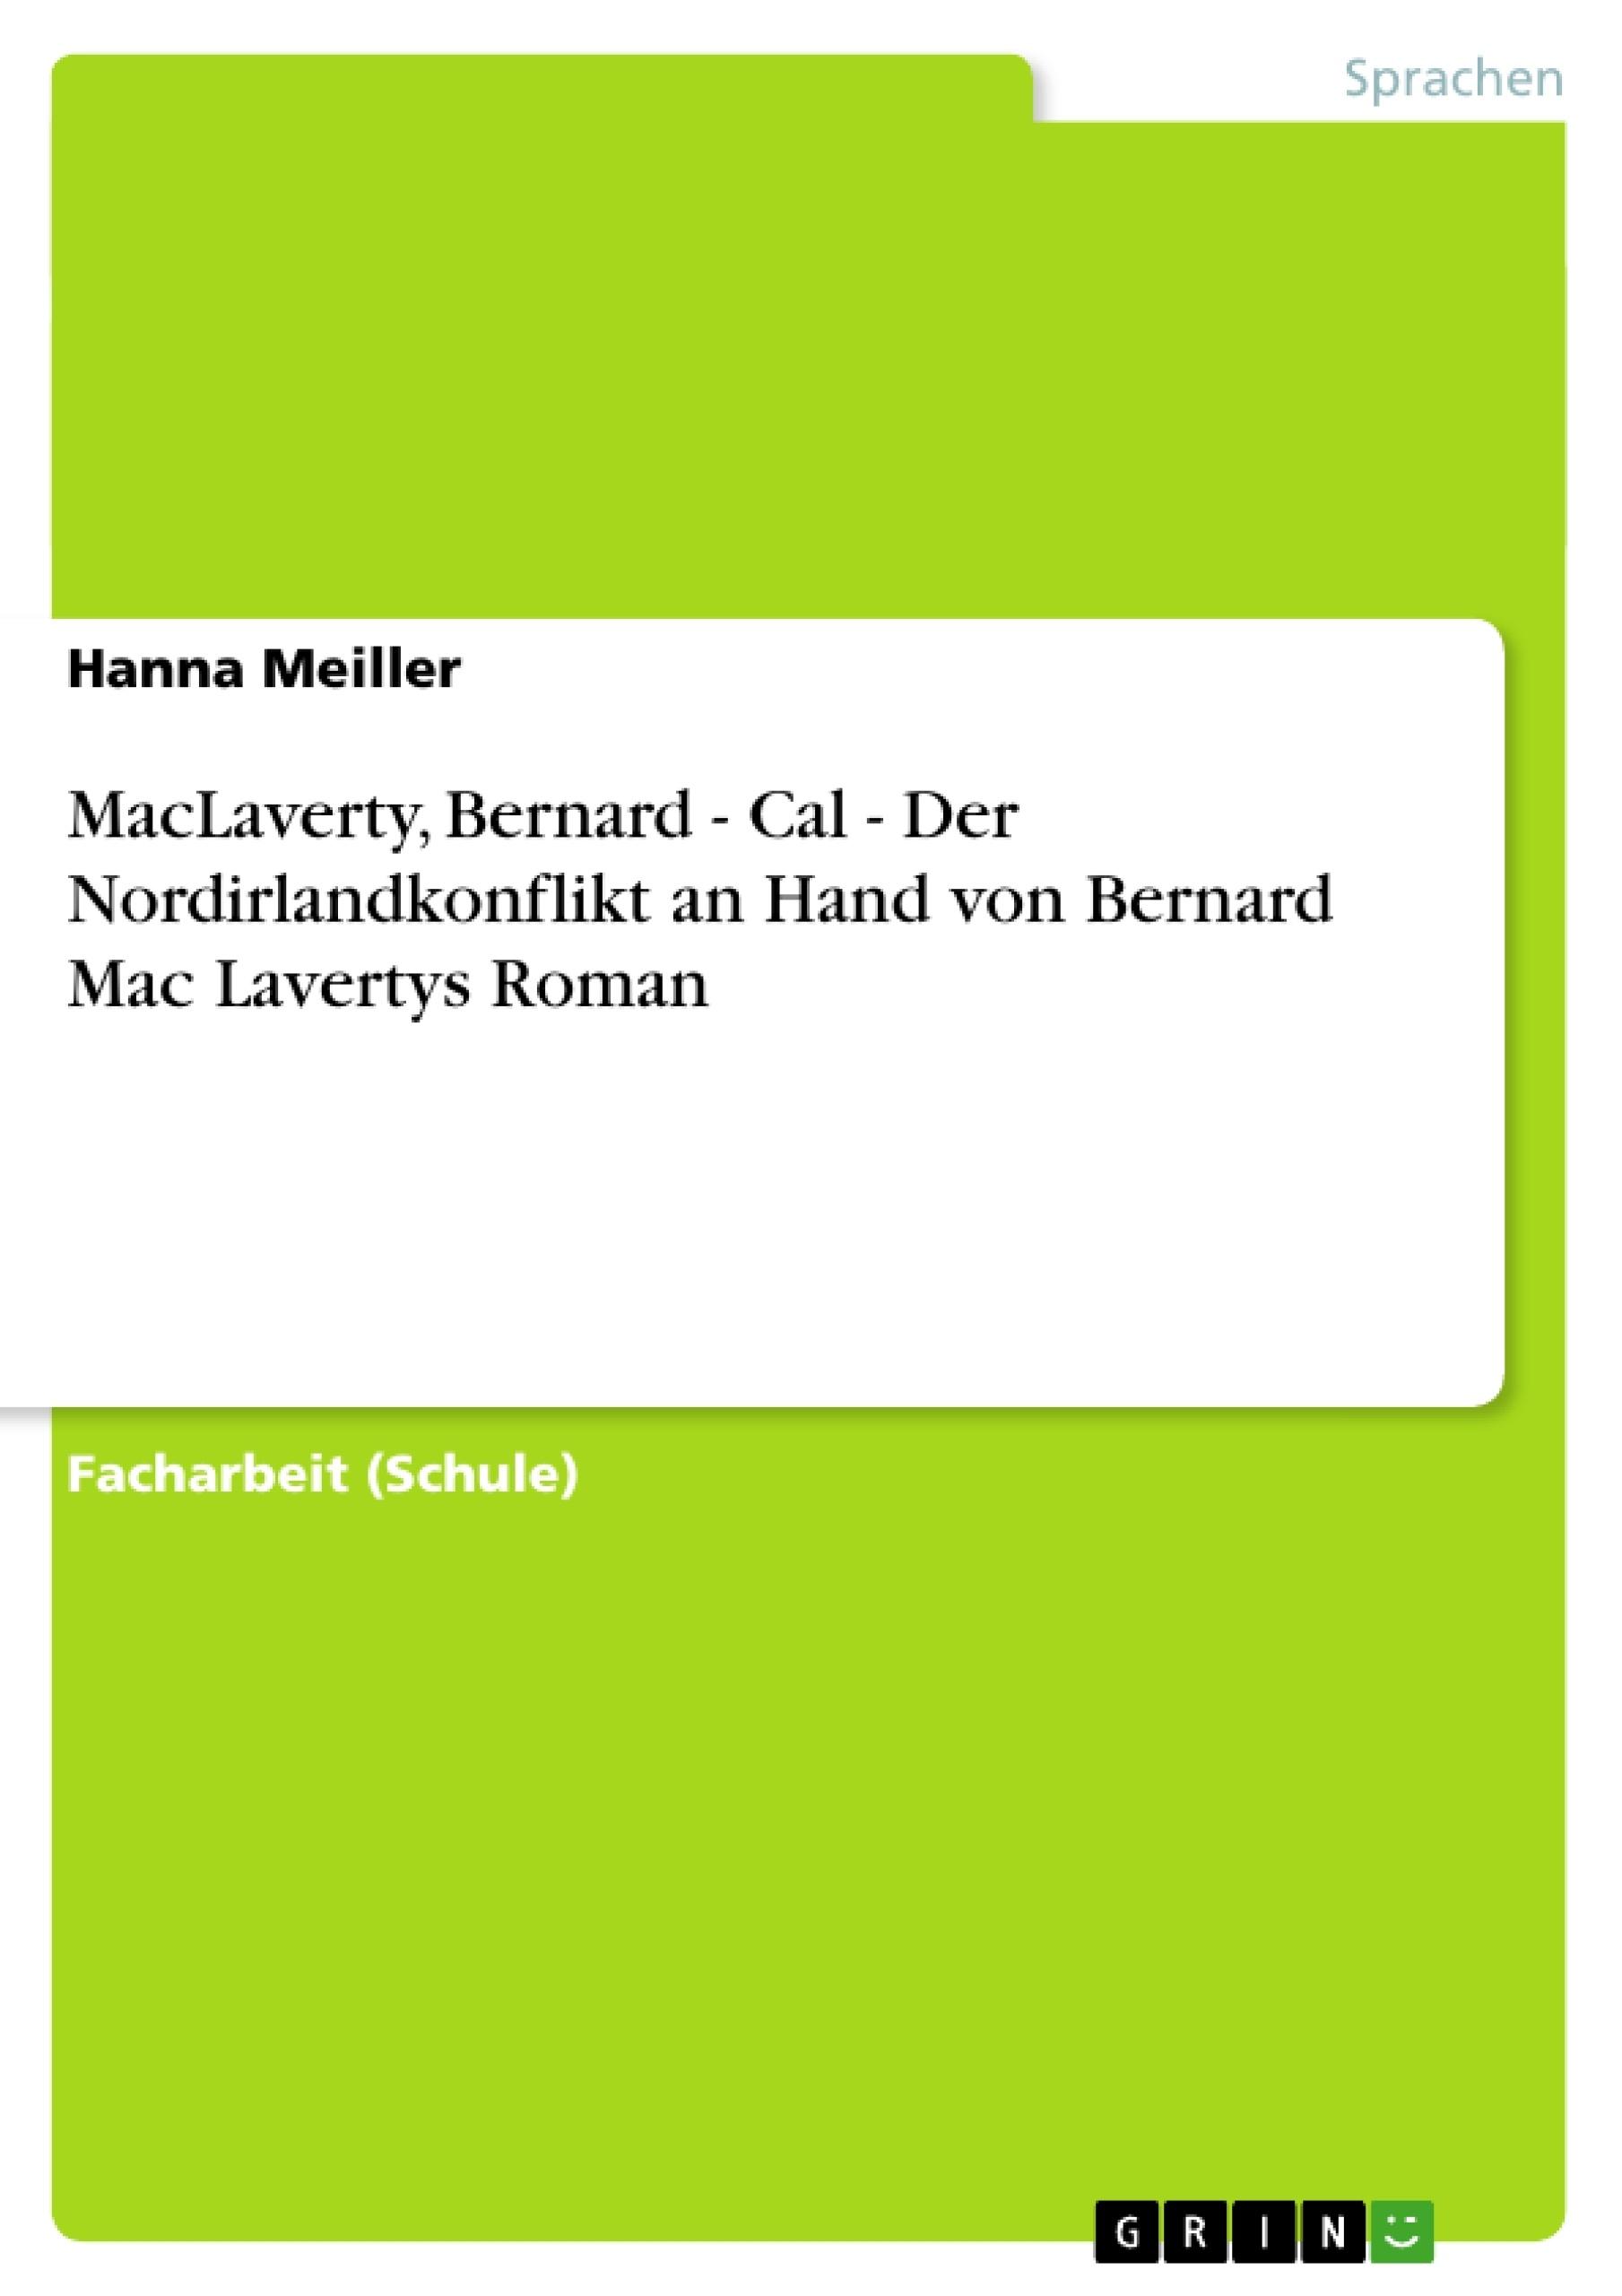 Titel: MacLaverty, Bernard - Cal - Der Nordirlandkonflikt an Hand von Bernard Mac Lavertys Roman